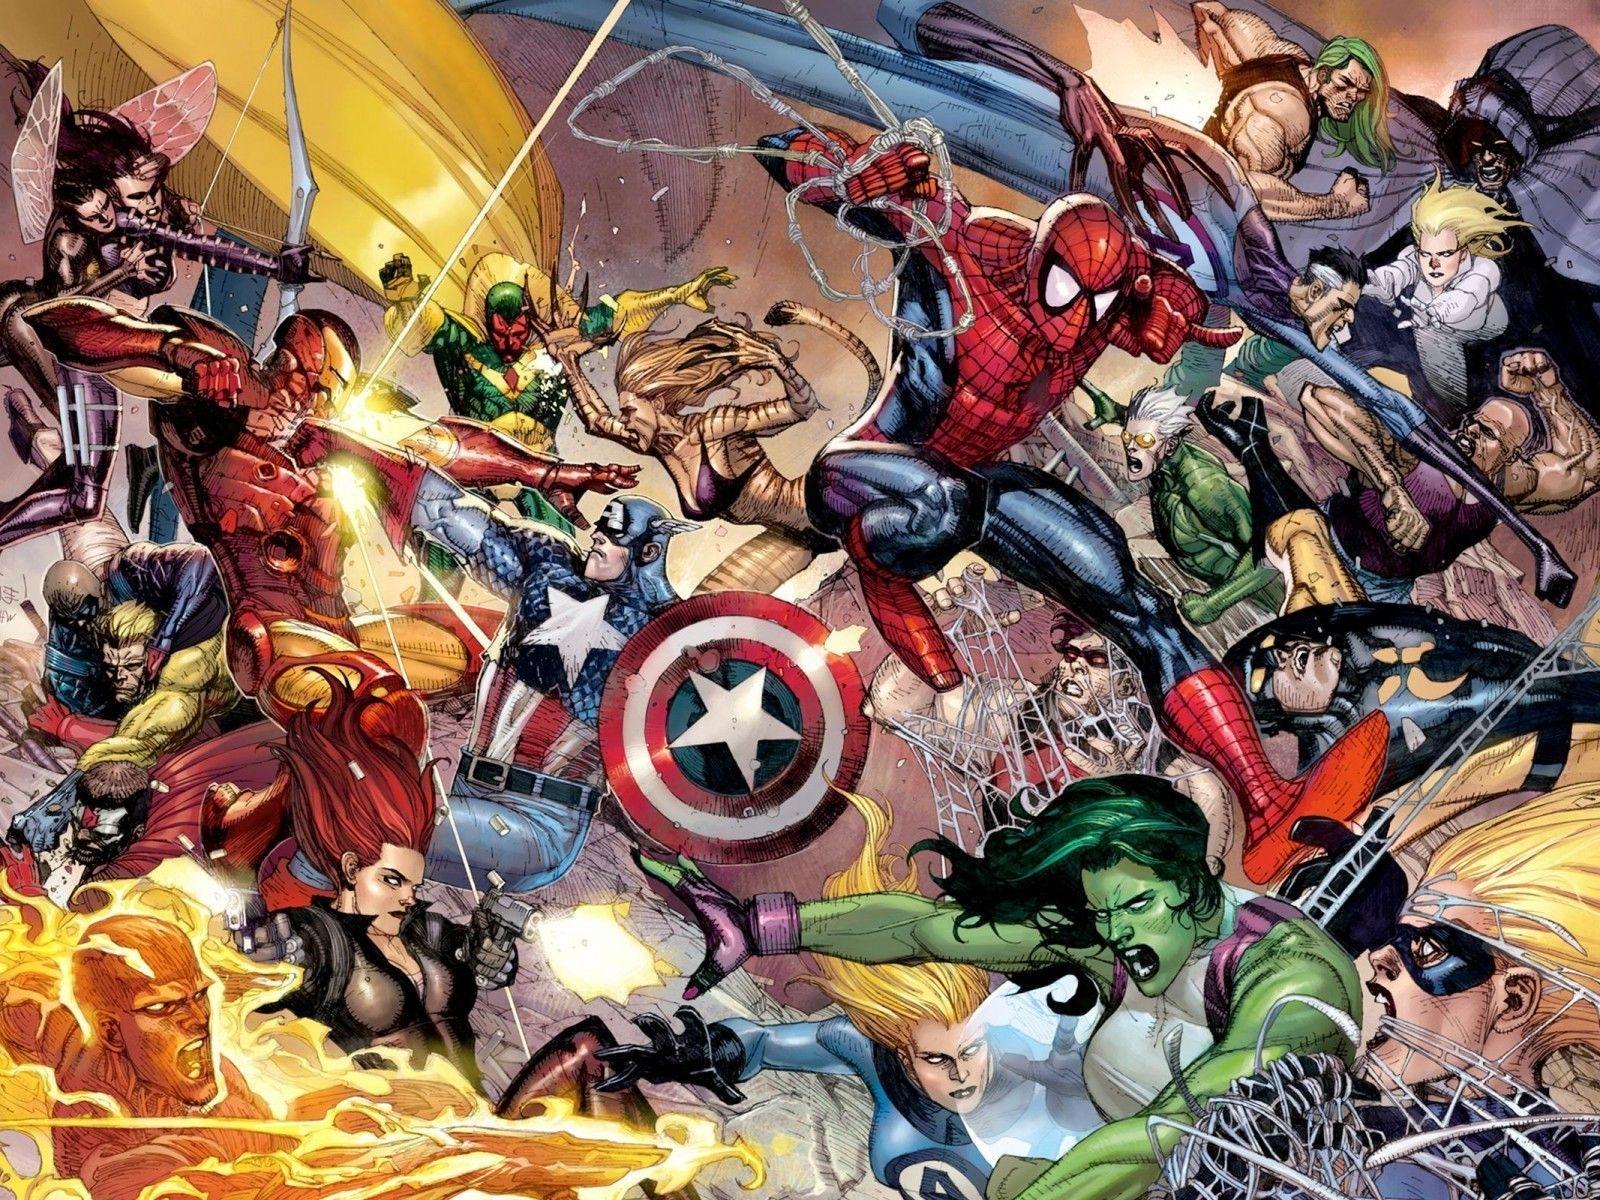 marvel civil war wallpapers wallpaper | hd wallpapers | pinterest